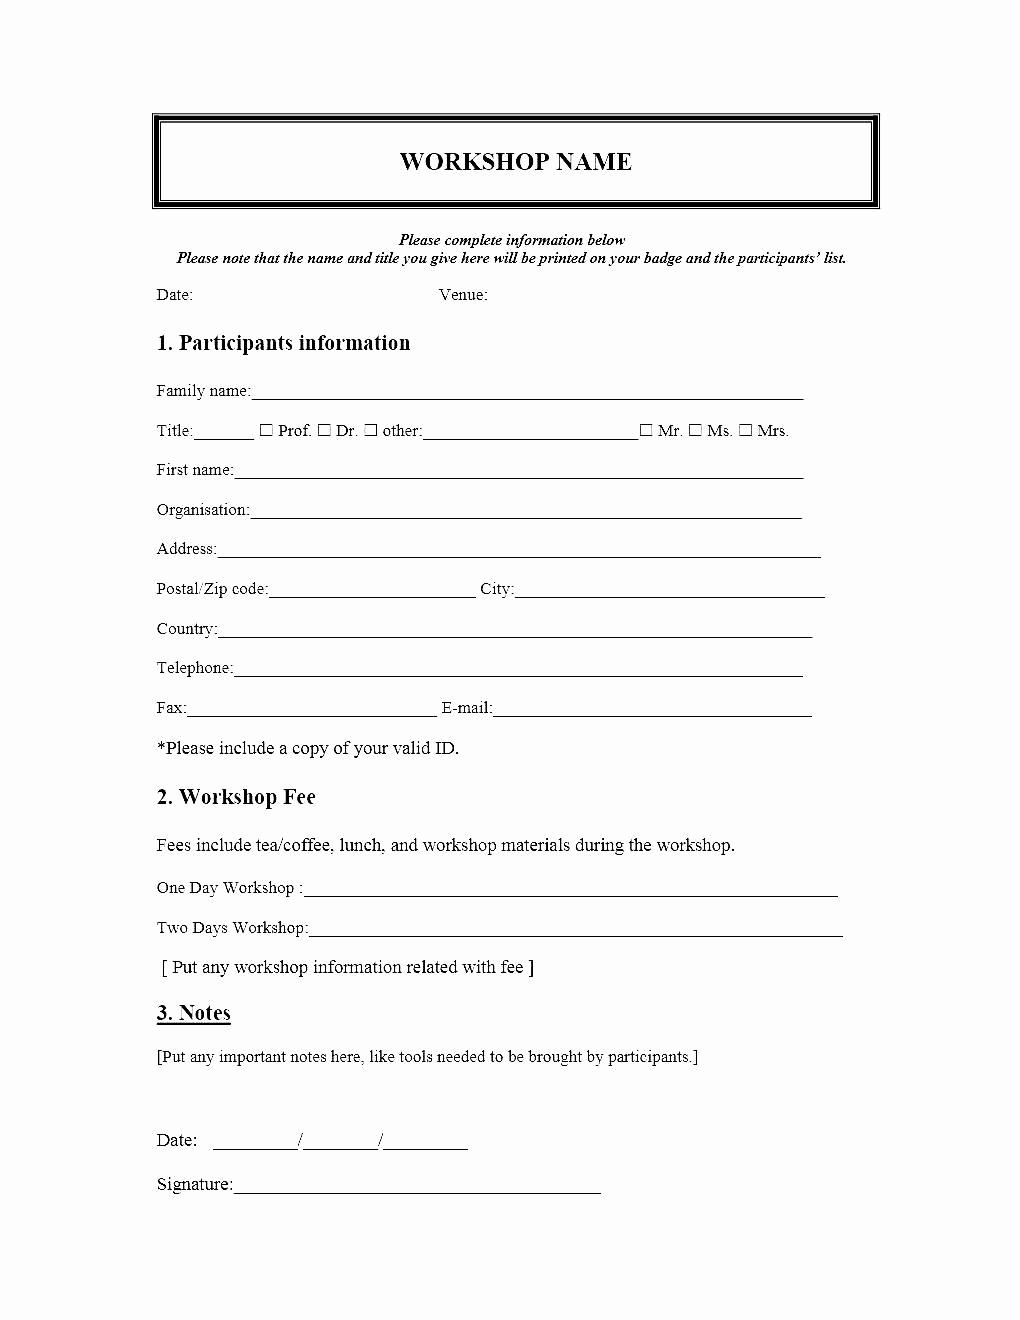 Free Registration forms Template Elegant event Registration form Template Microsoft Word